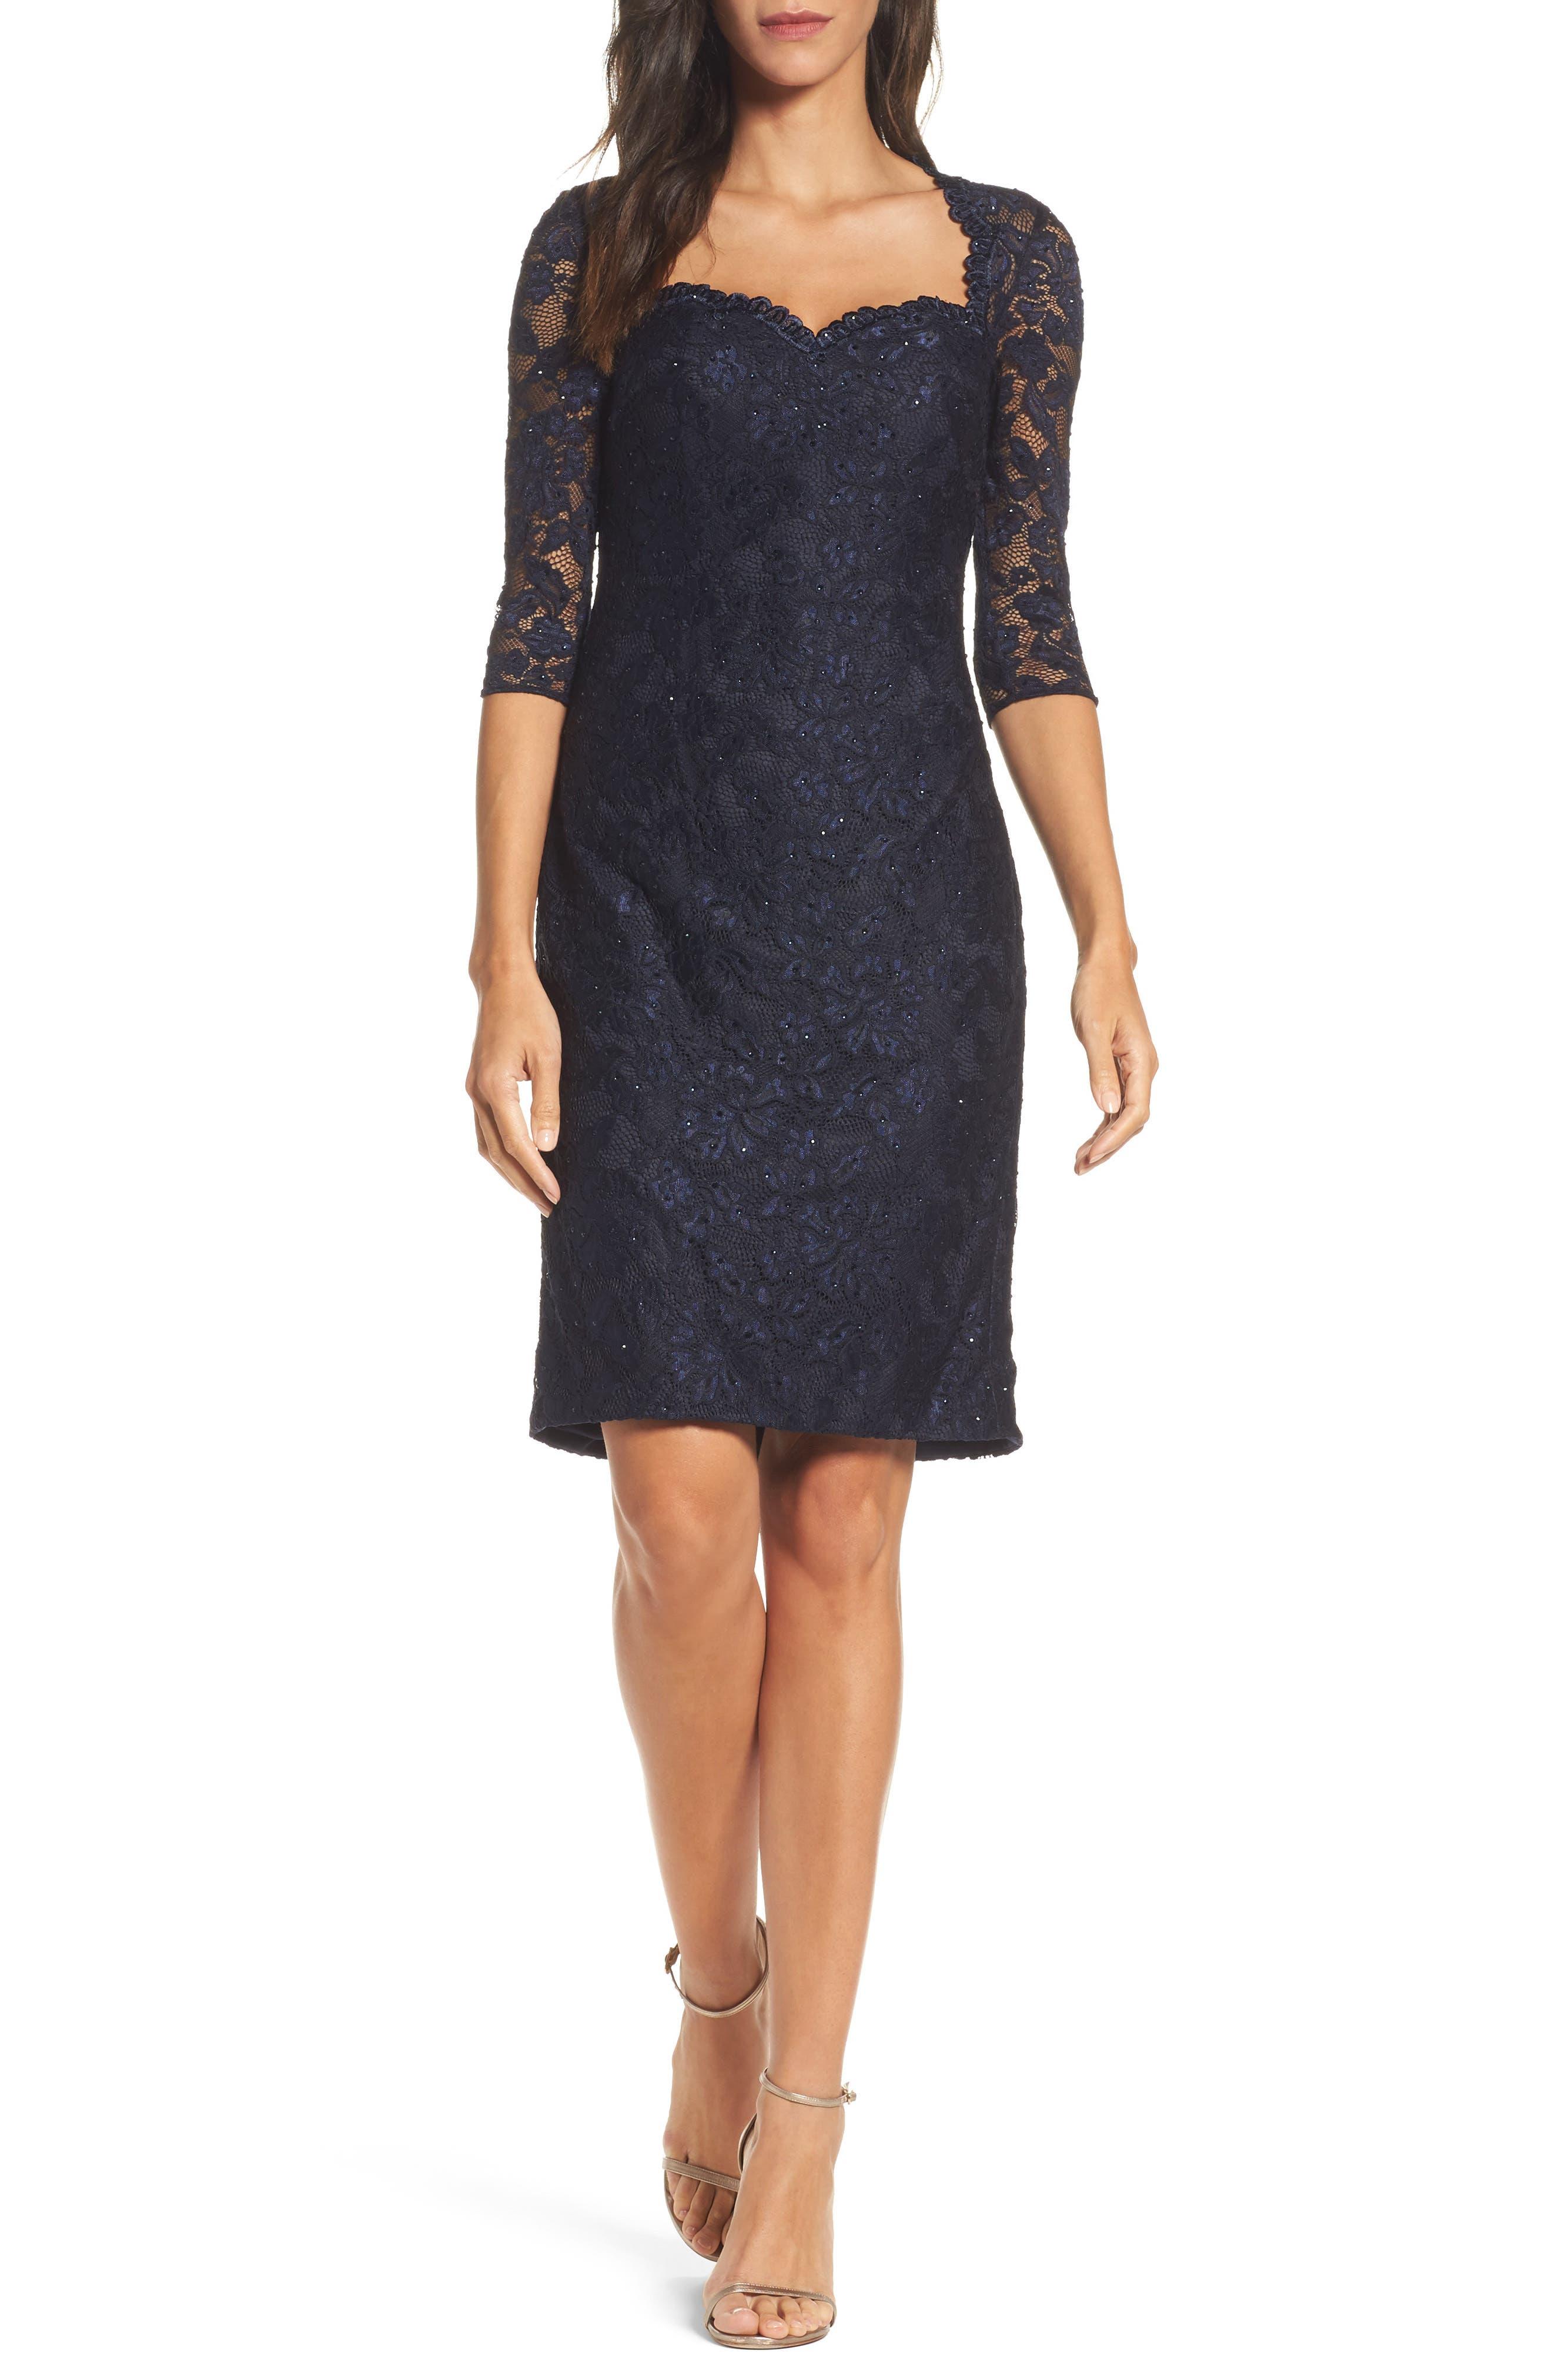 Alternate Image 1 Selected - La Femme Sweetheart Lace Sheath Dress